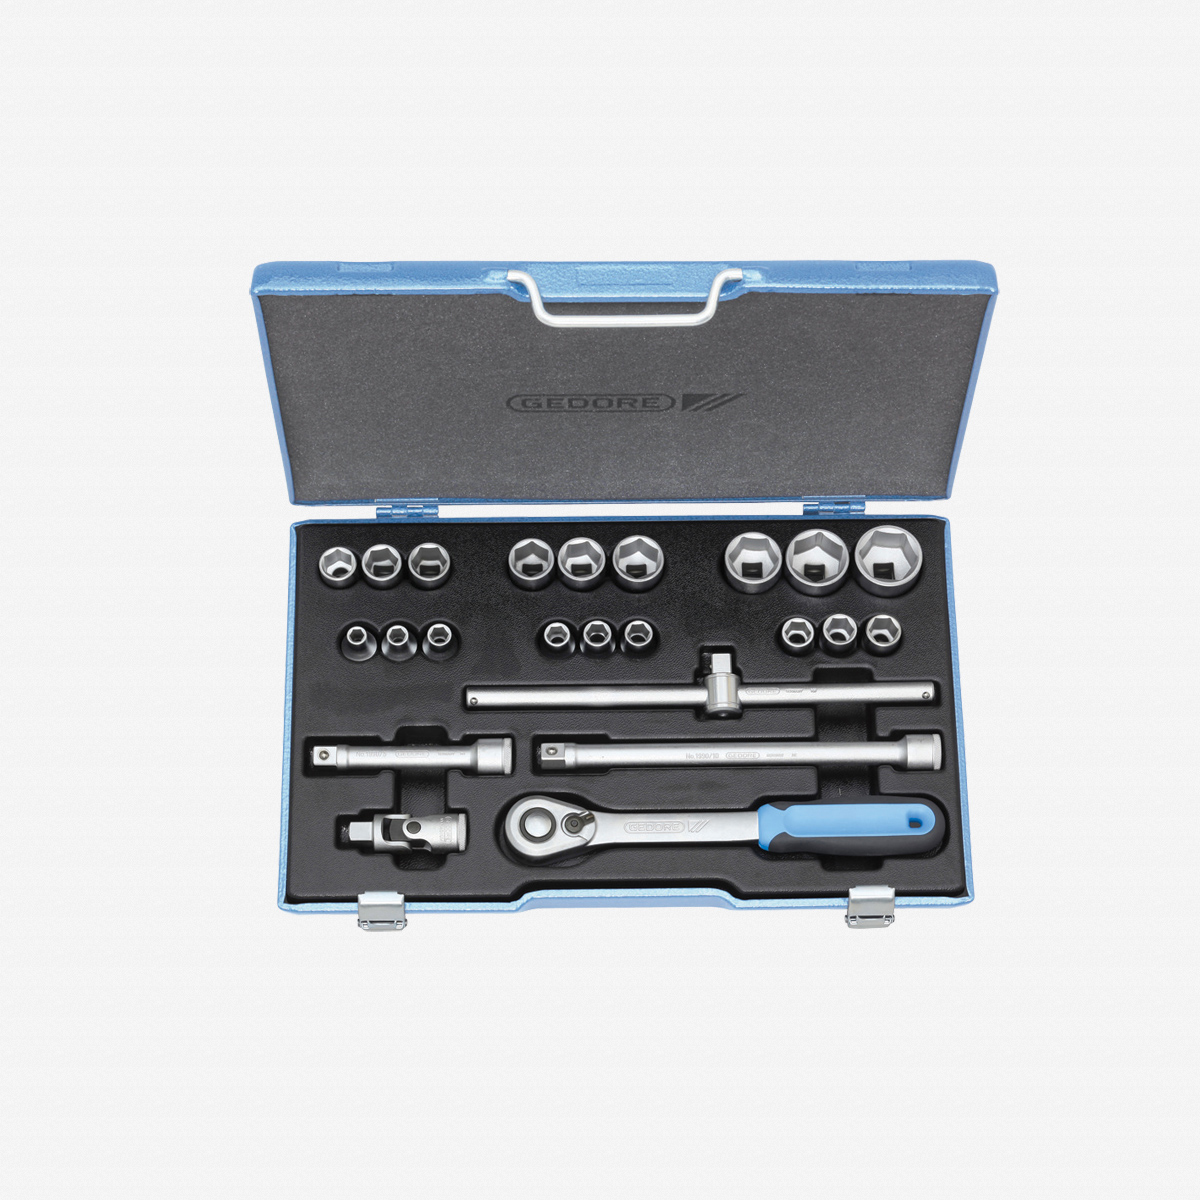 "Gedore 19 EMU-20 Socket set 1/2"", 23 pcs hex 8-32 mm - KC Tool"